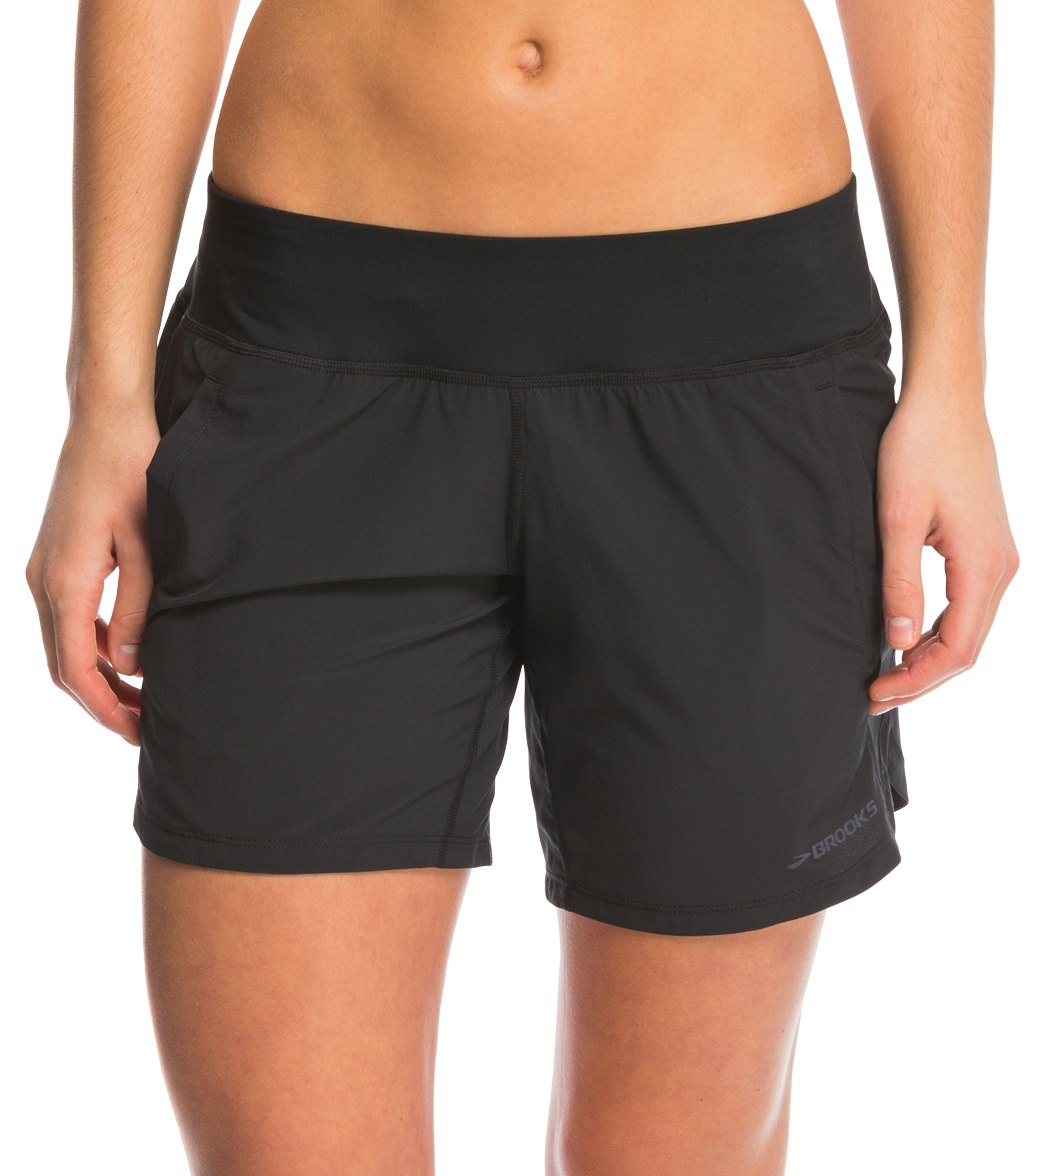 7 inch shorts womens